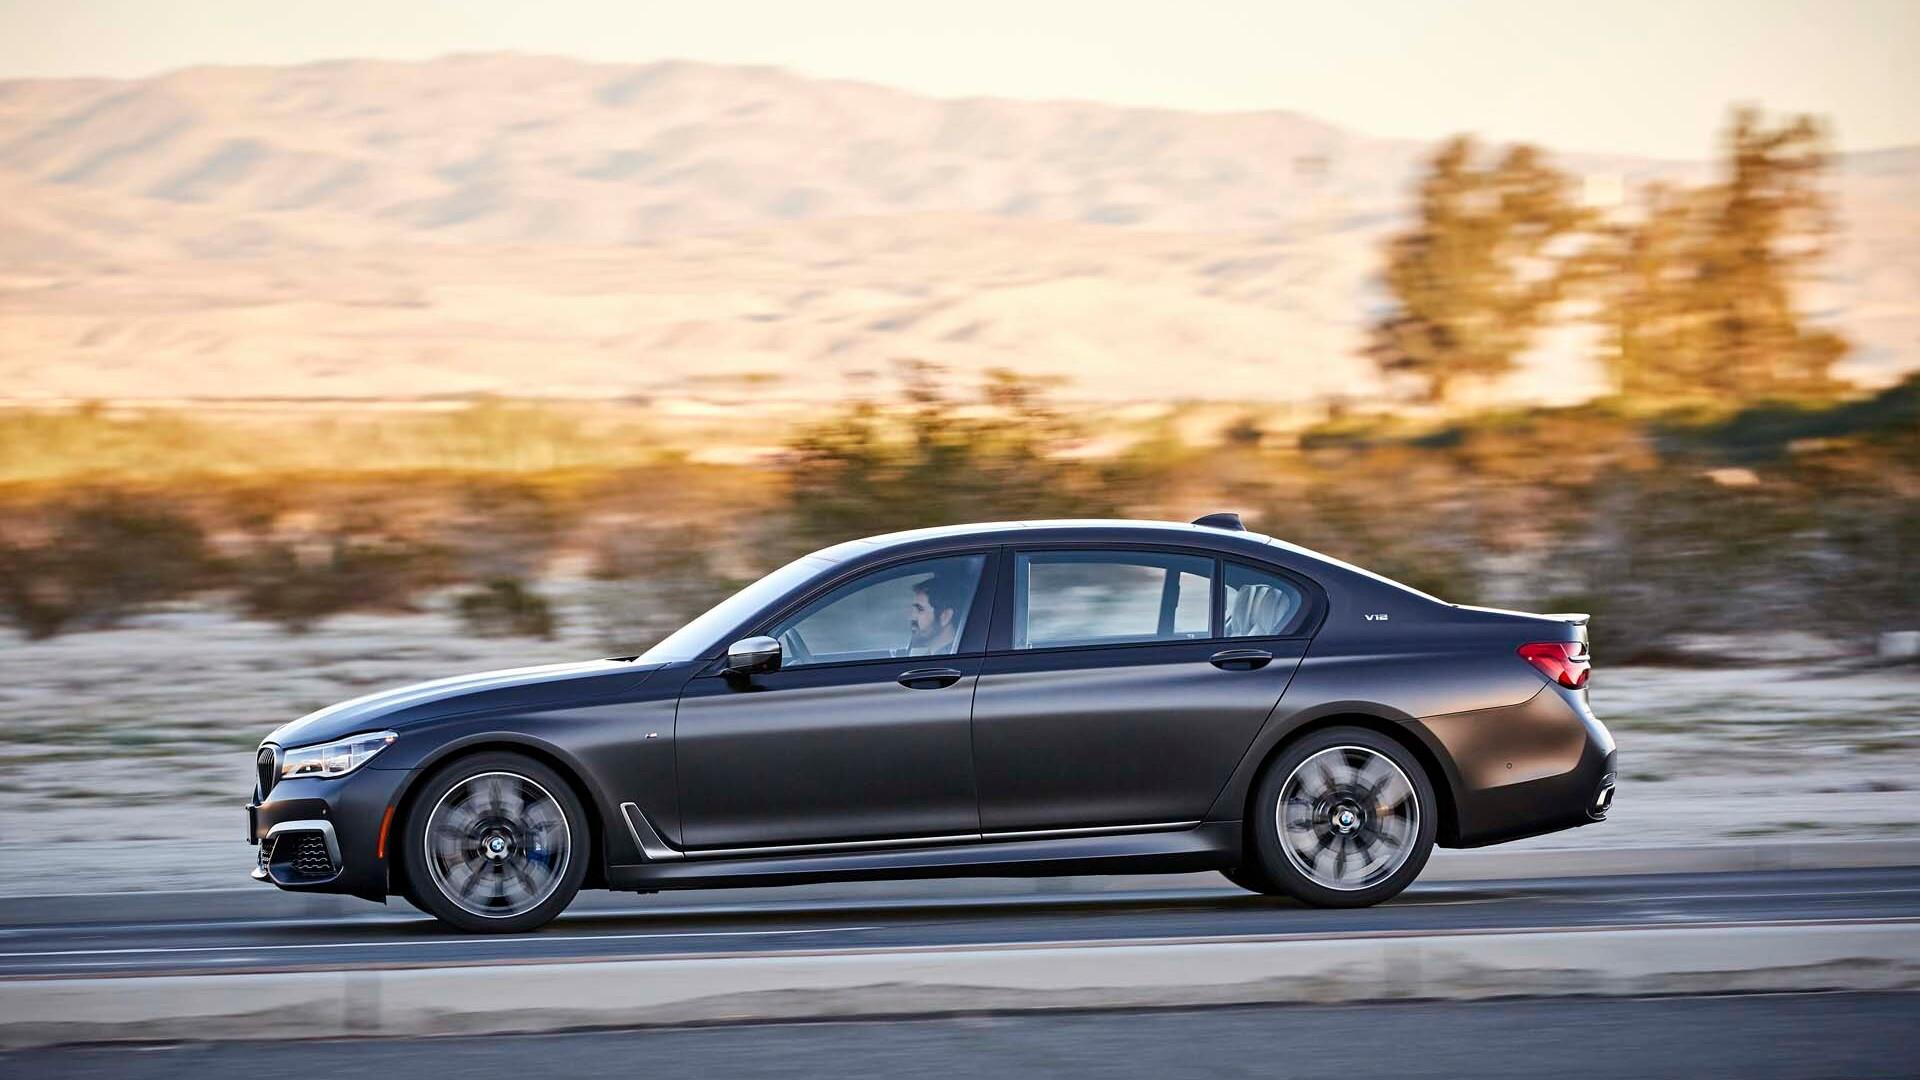 2019 BMW 7-Series (M760i)